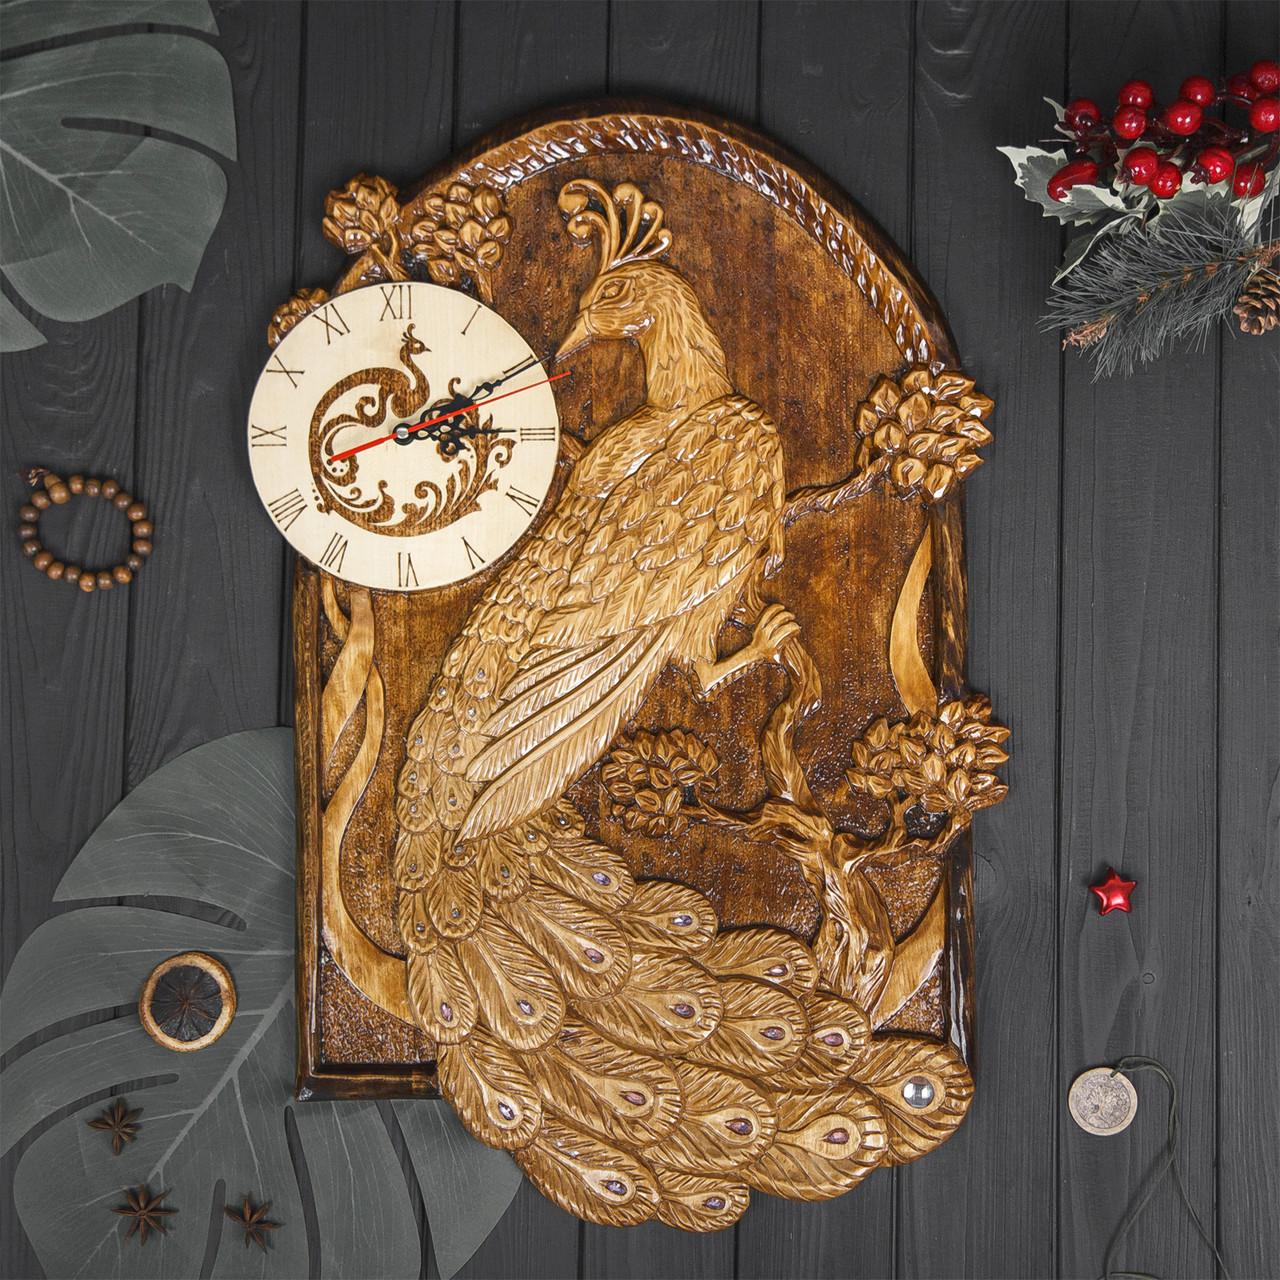 Часы настенные Жар-птица, ручная резьба + выжигание